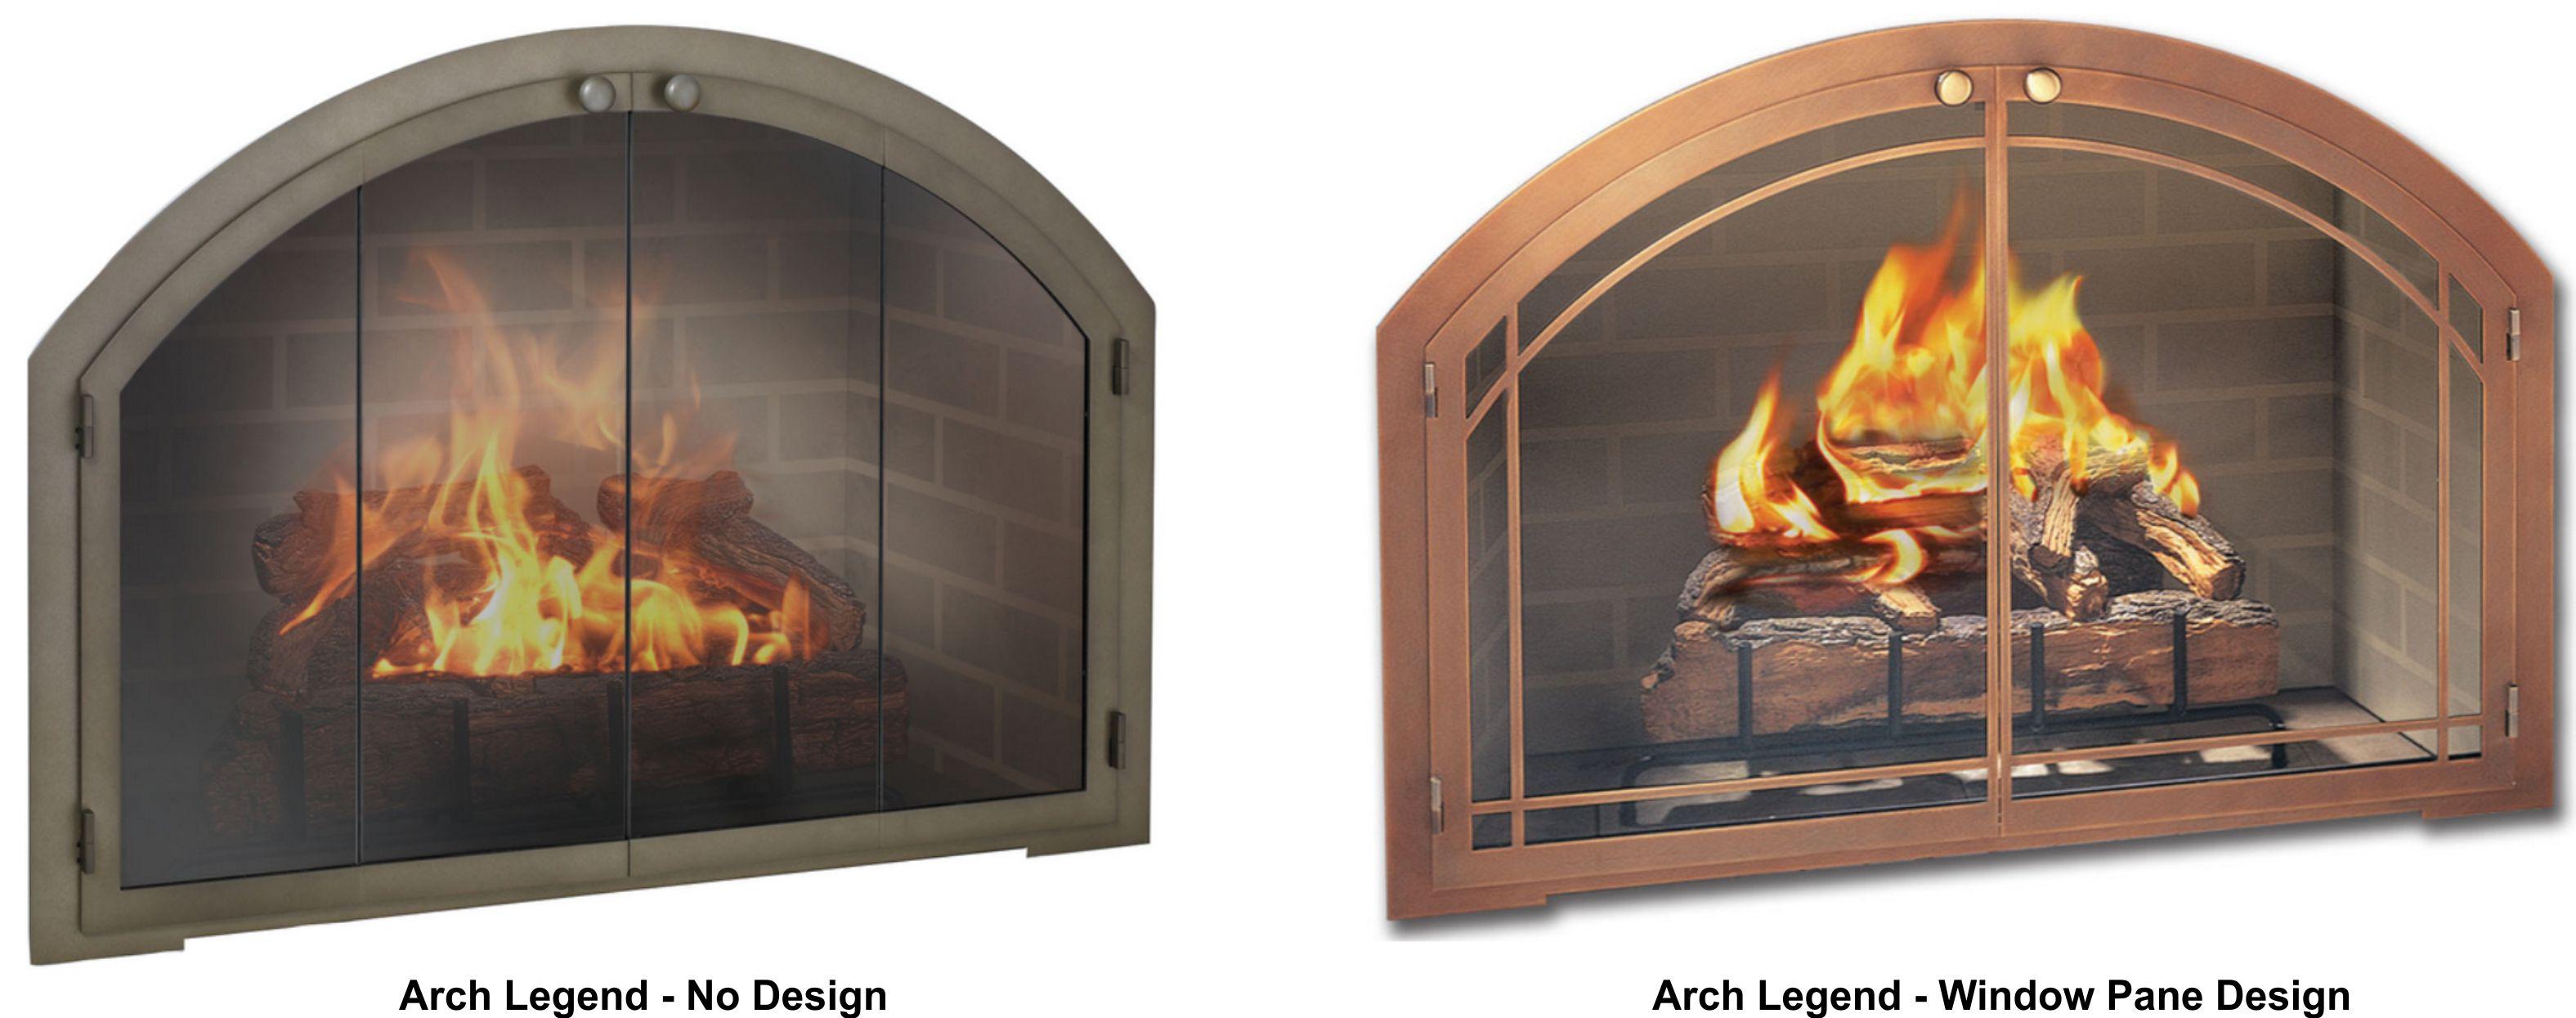 Optional designs